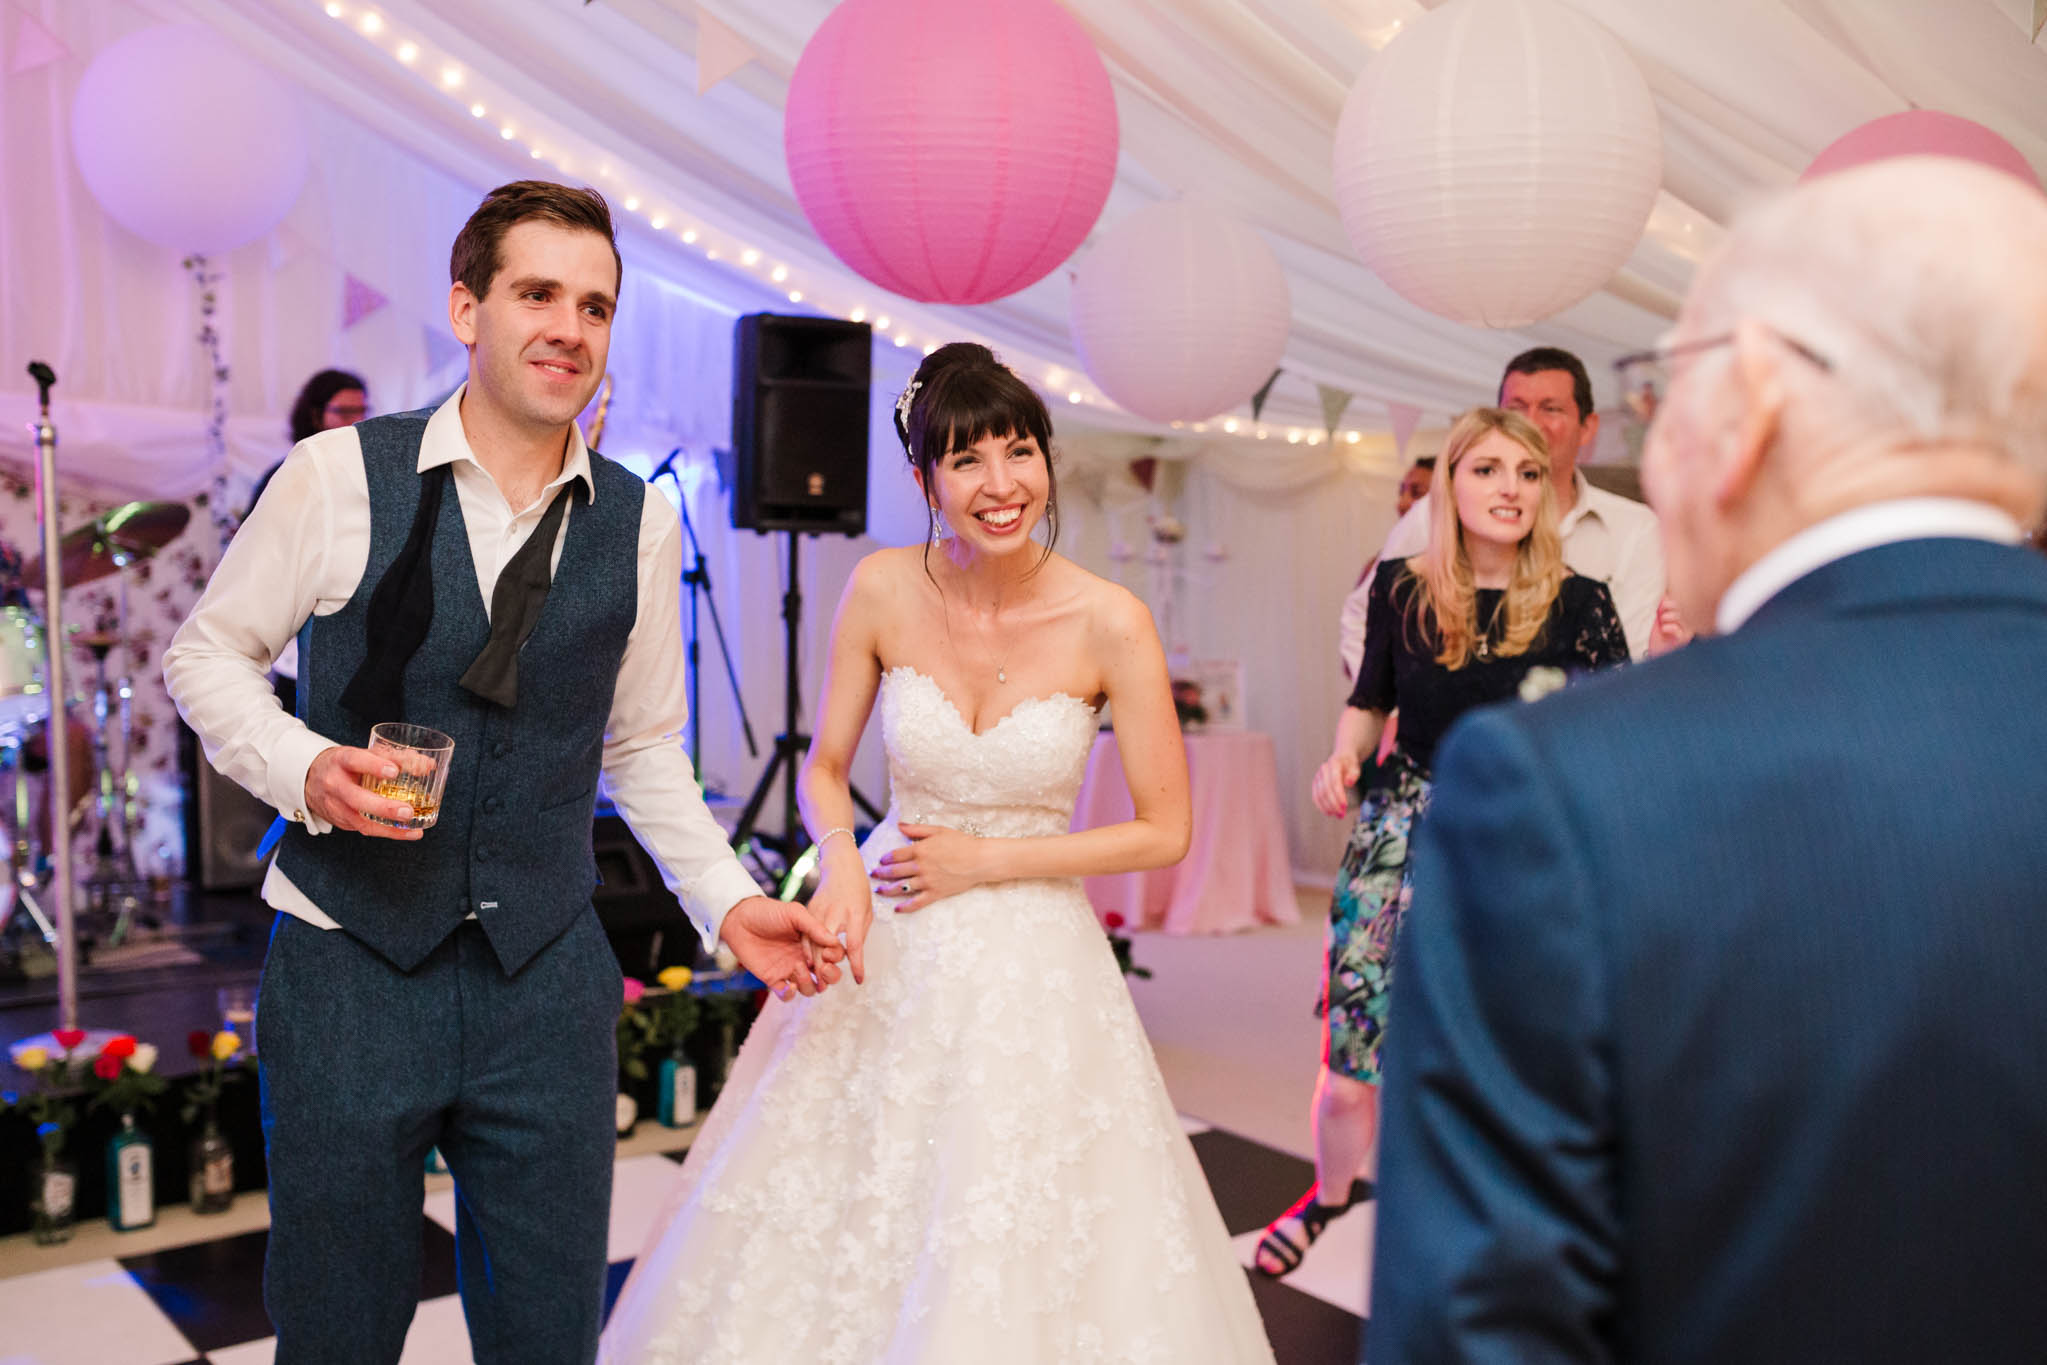 bride and groom laughing on dance floor